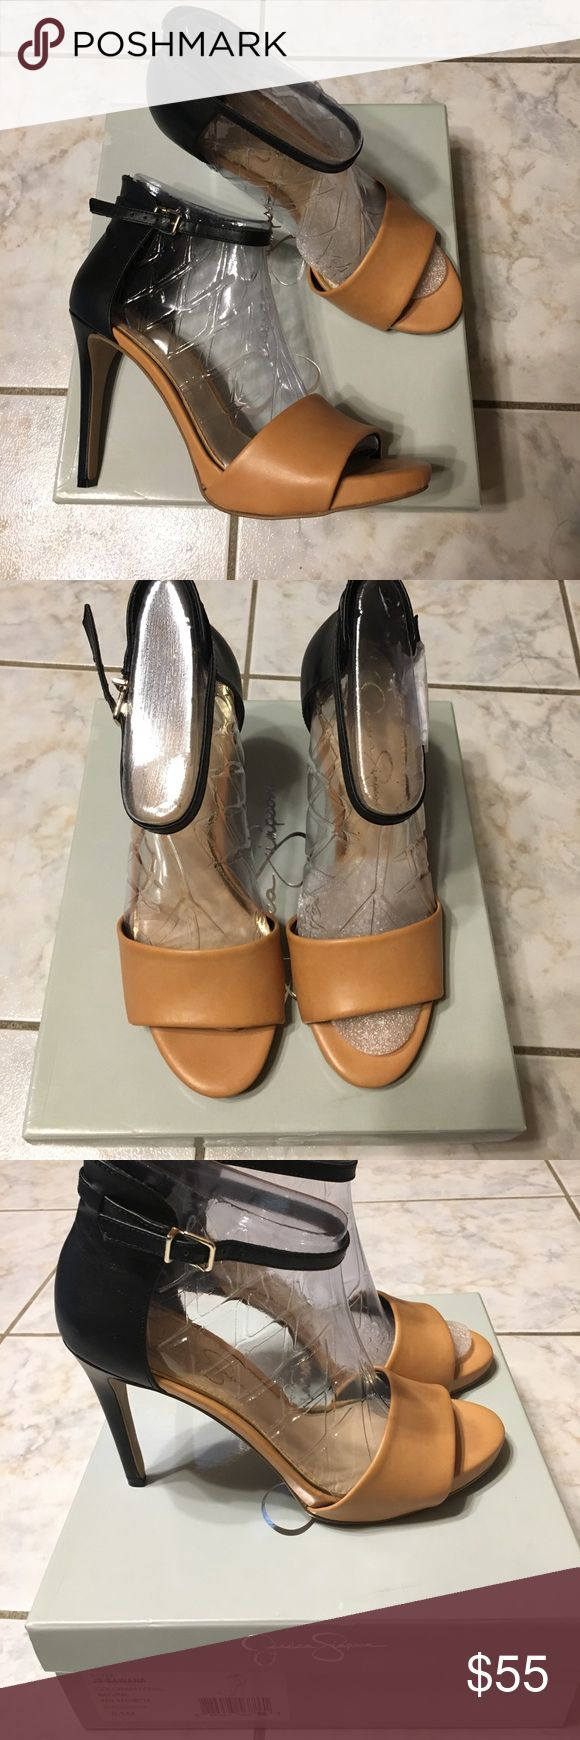 Jessica Simpson Sandals New! Jessica Simpson Shoes Sandals